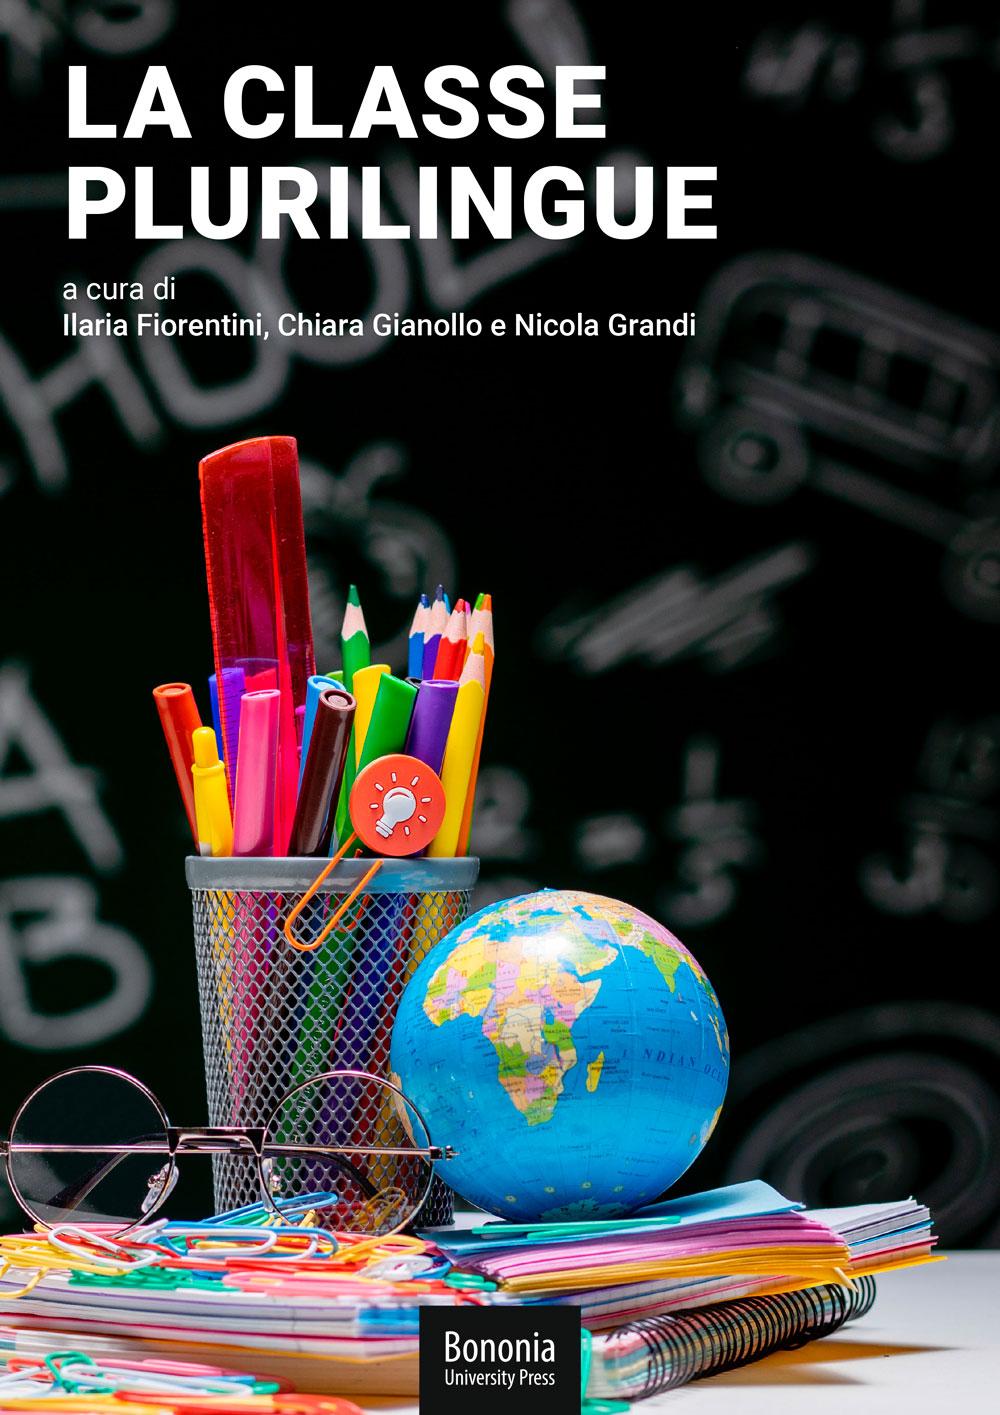 La classe plurilingue - Bononia University Press